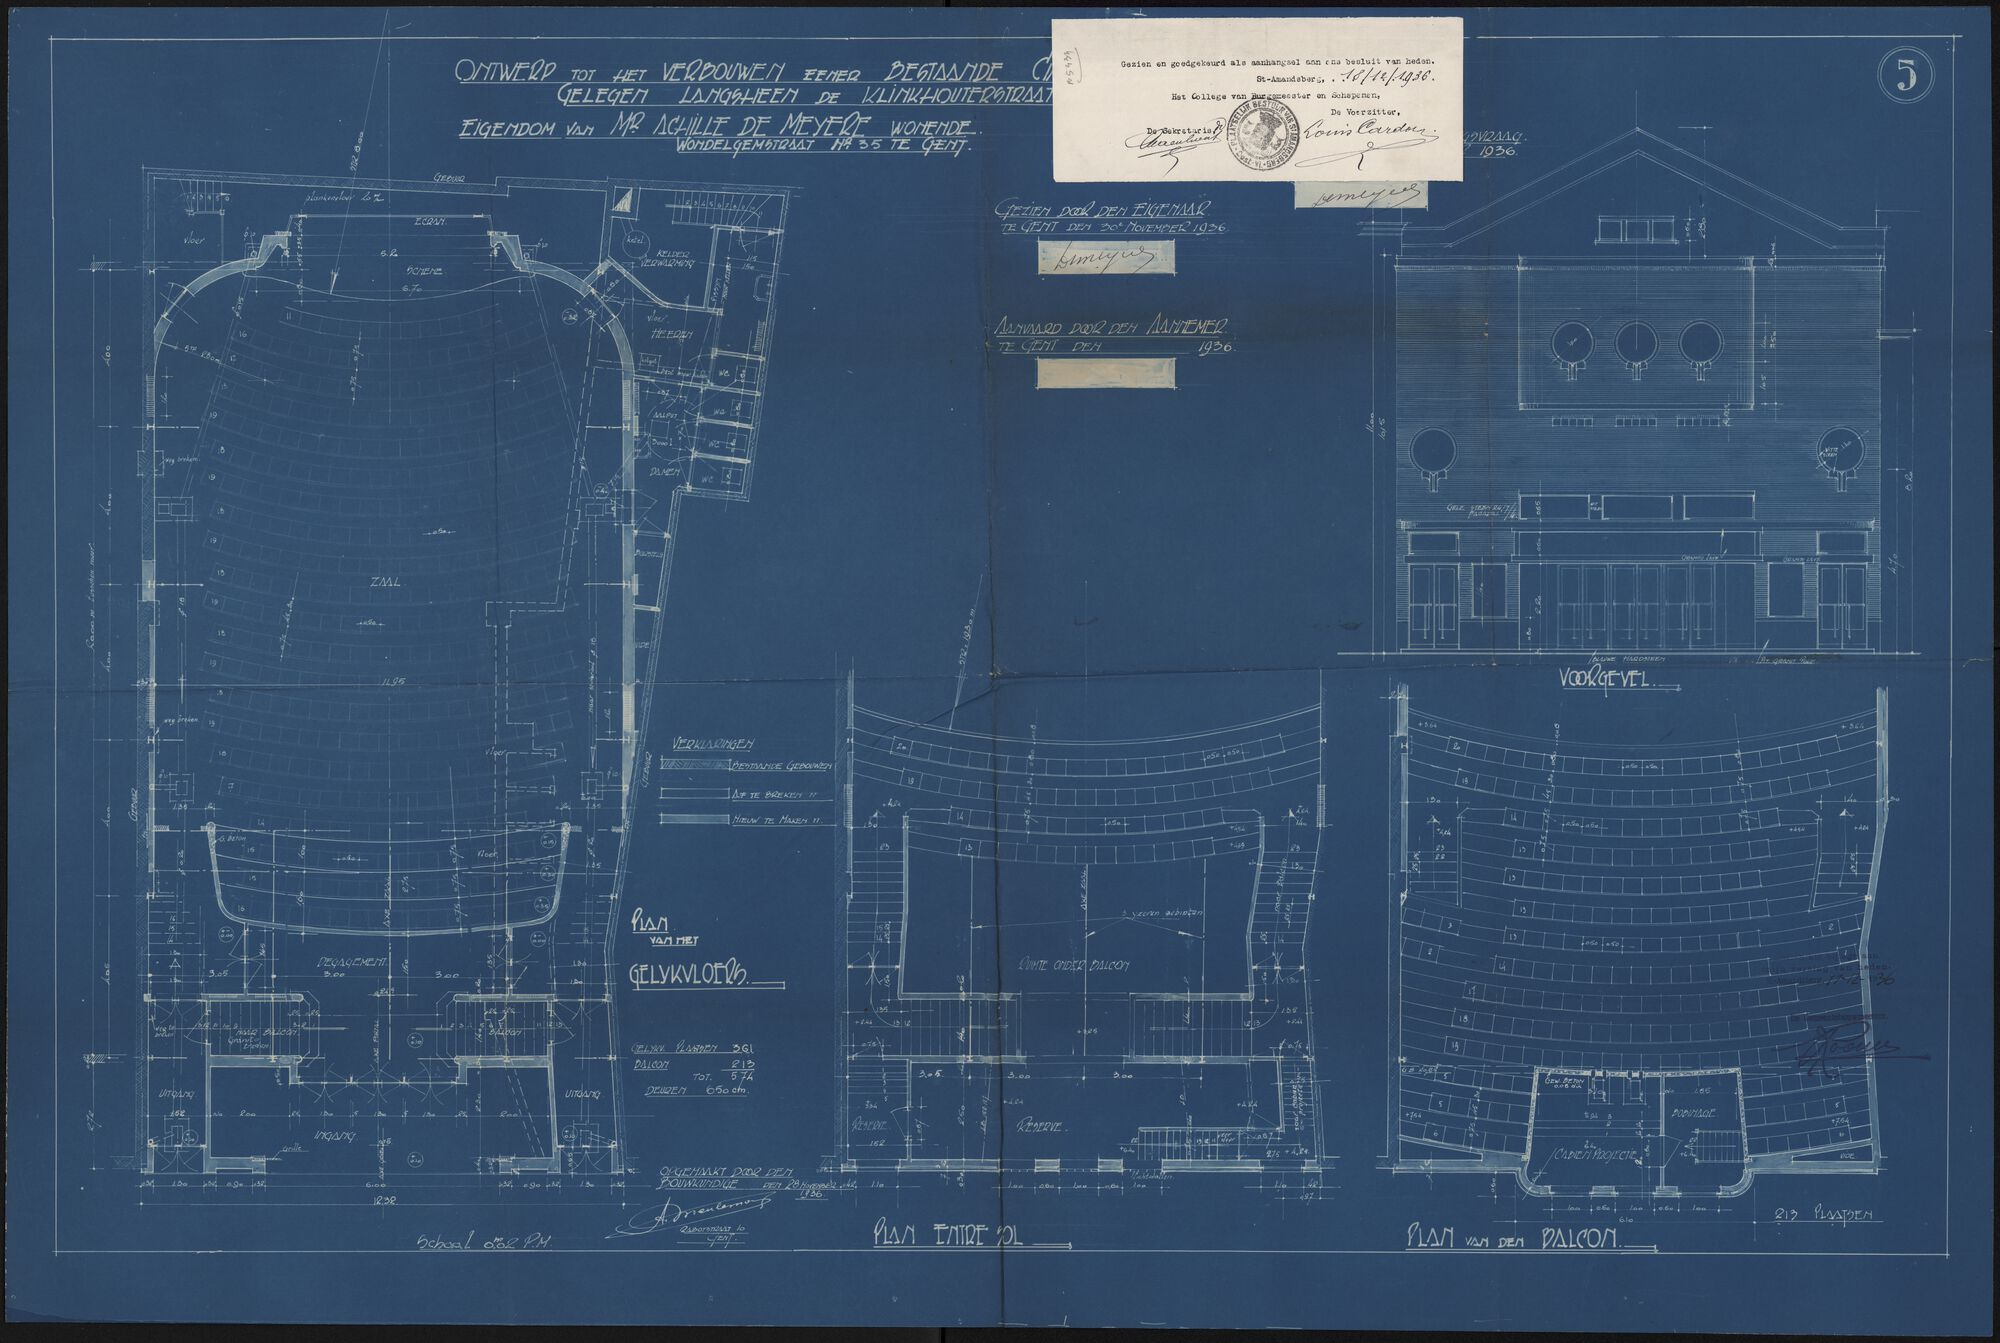 Sint-Amandsberg: Heernisplein - Klinkkouterstraat: cinema Metropole: bouwdossier, 1936